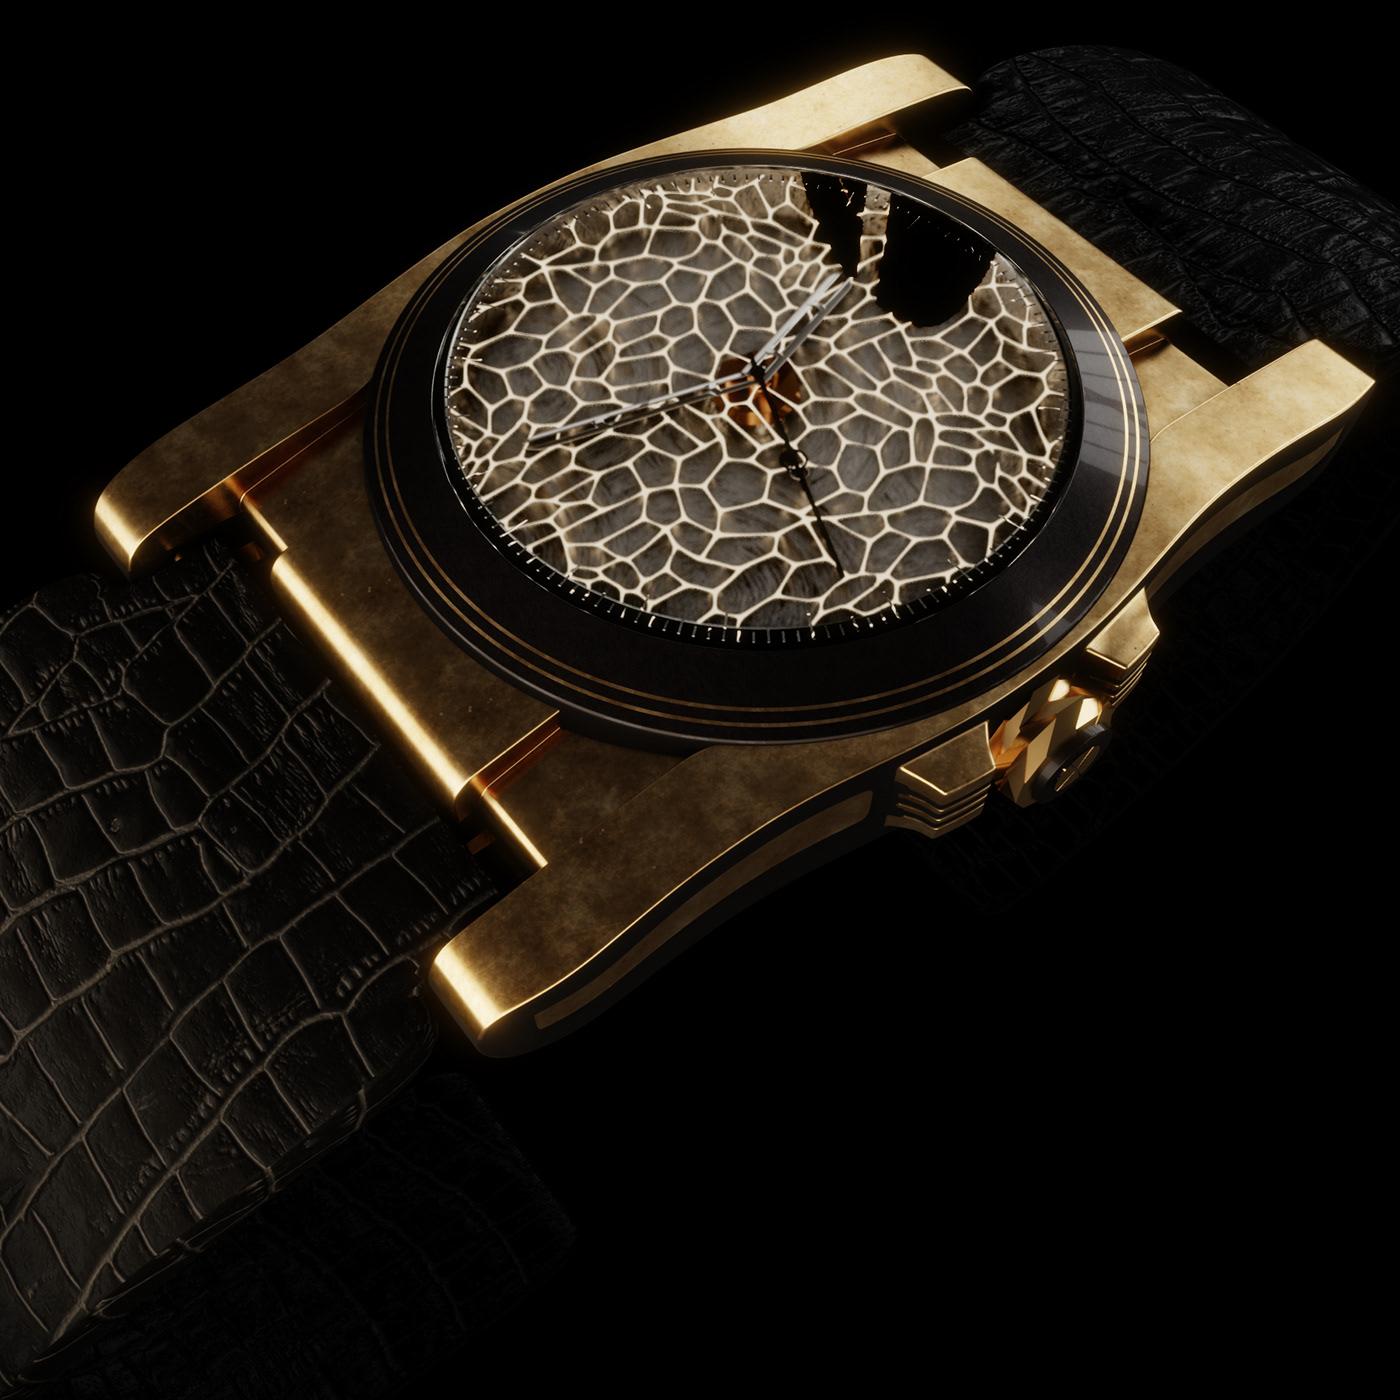 Art Deco watches design concept